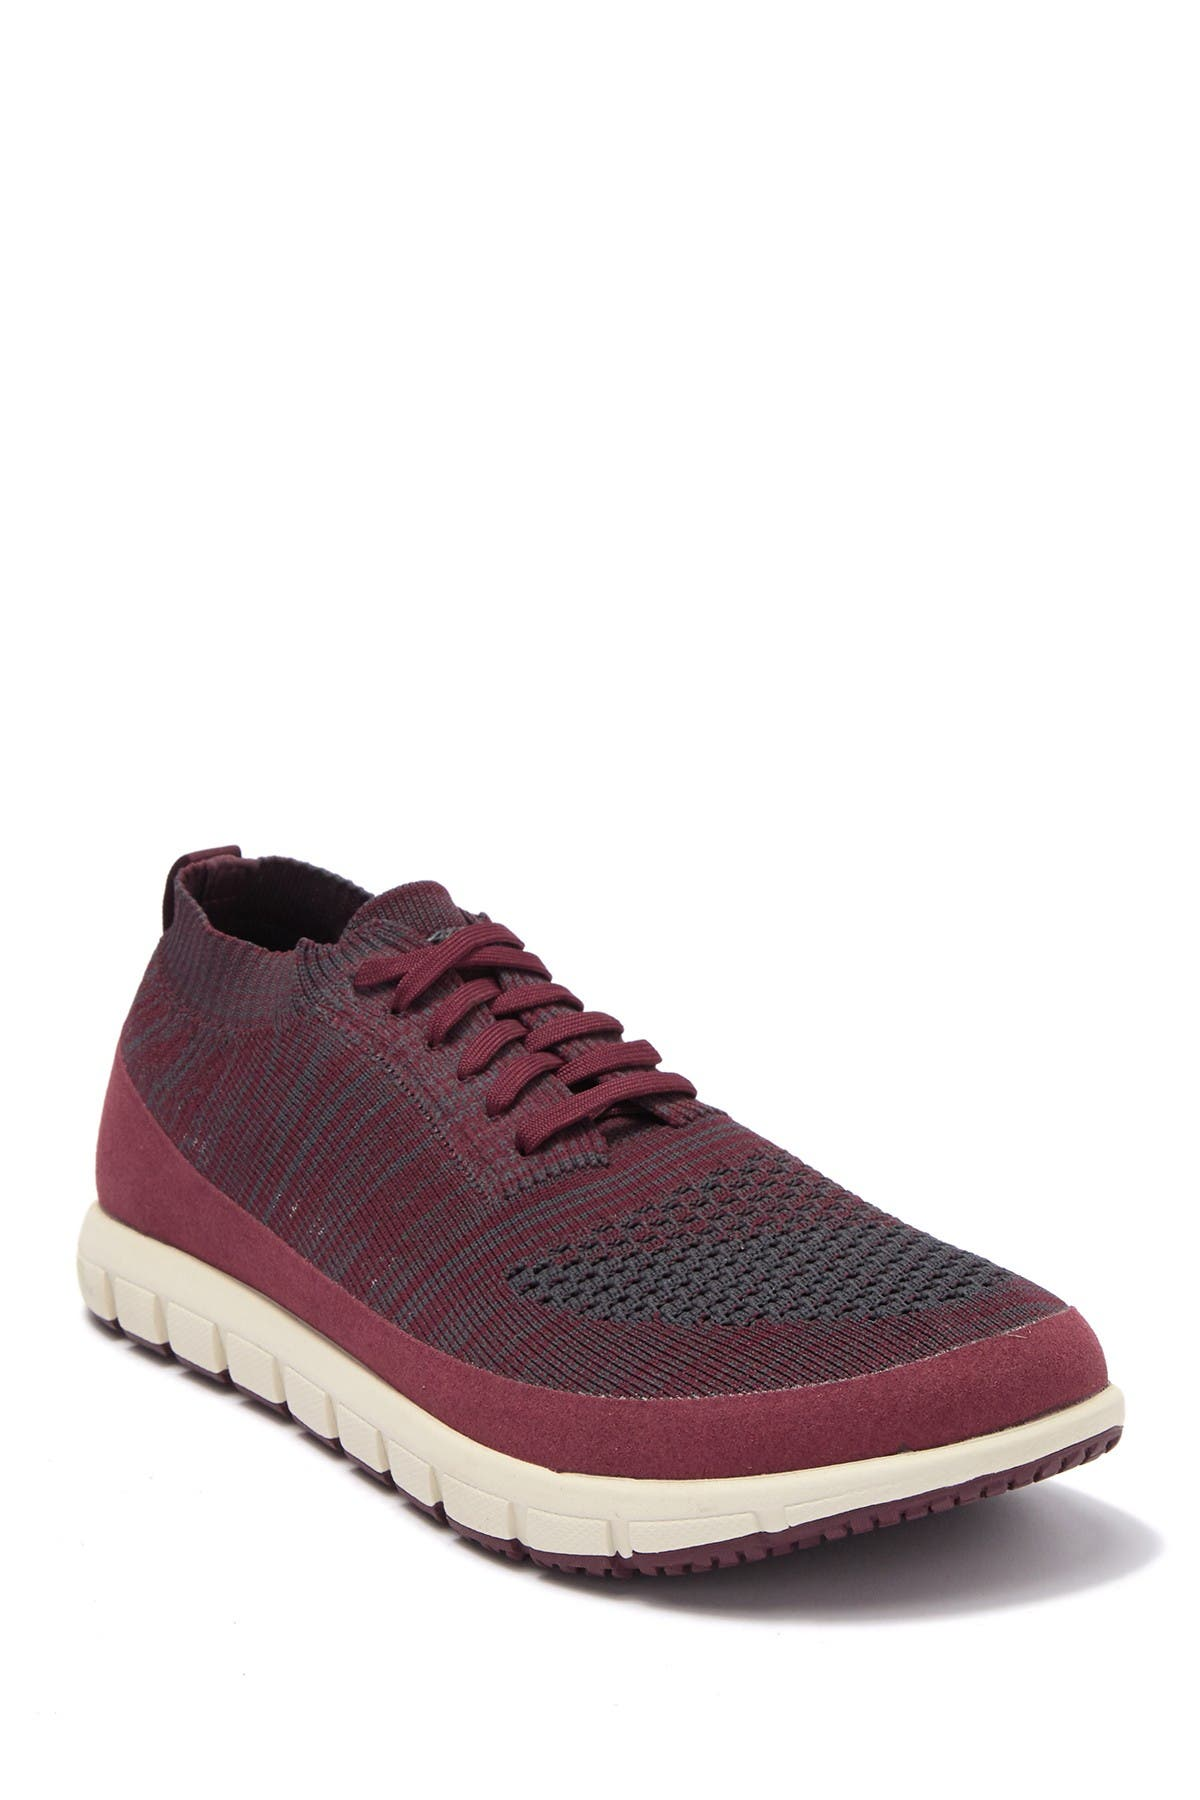 Image of ALTRA Vali Knit Sneaker